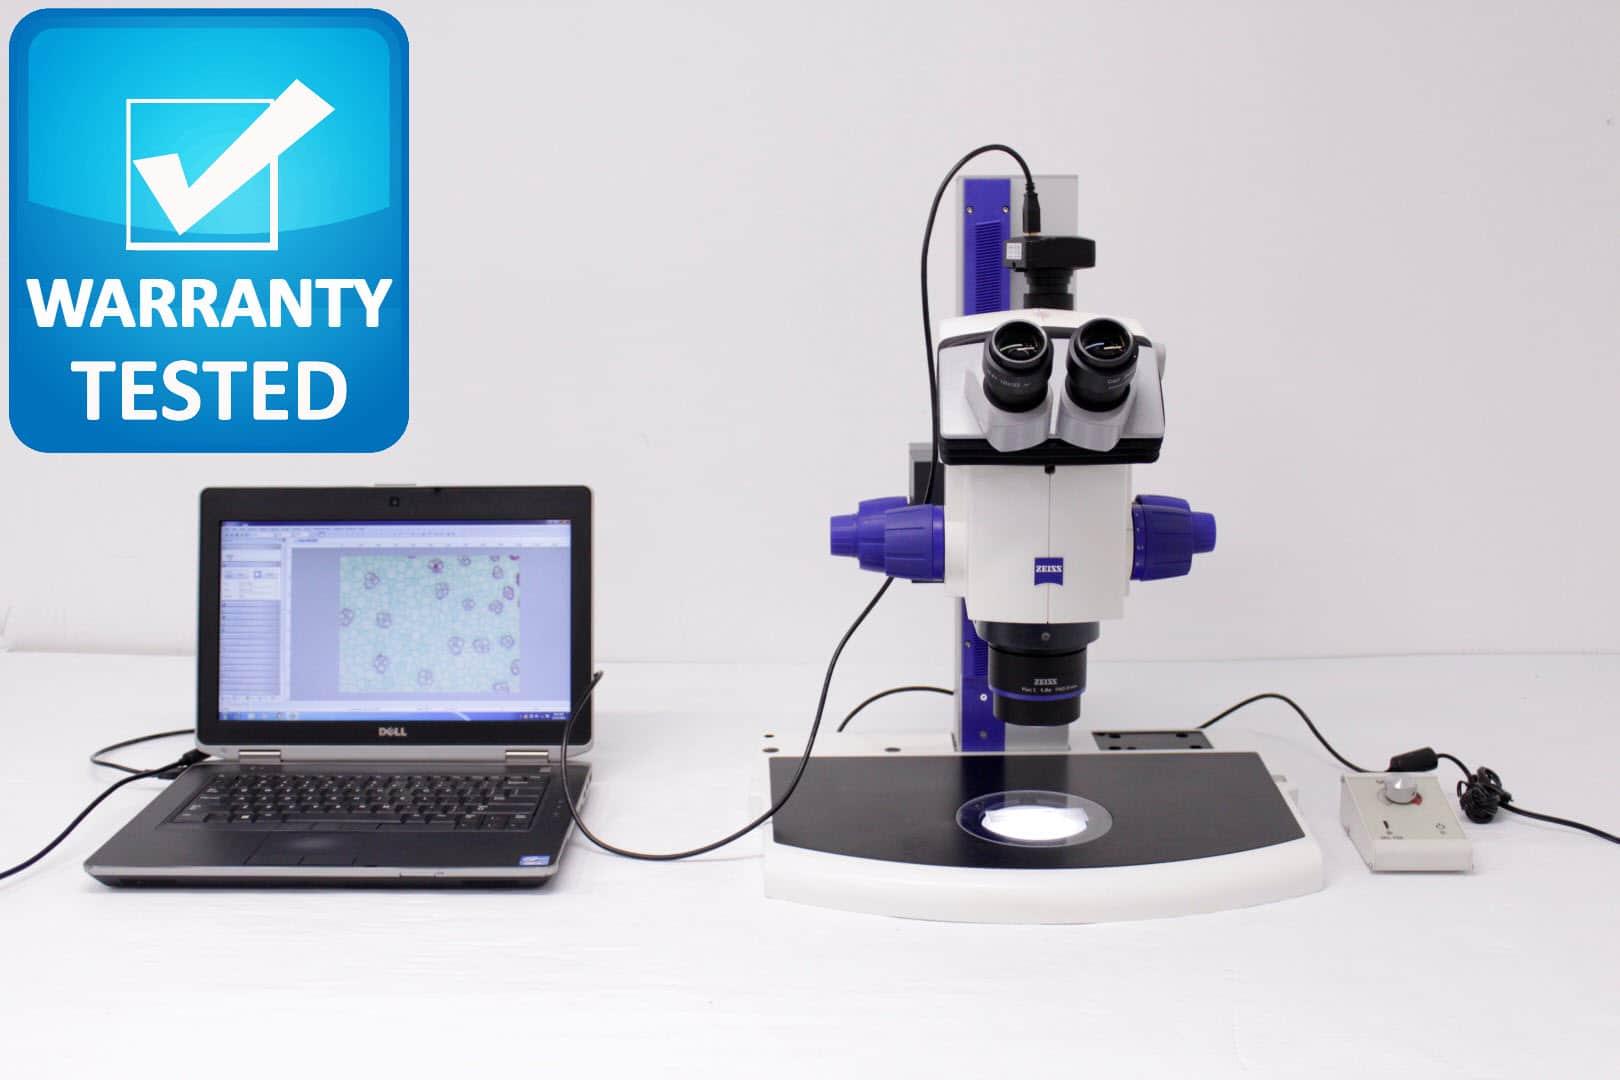 Zeiss Discovery.V8 Stereo Microscope Stereoscope Unit2